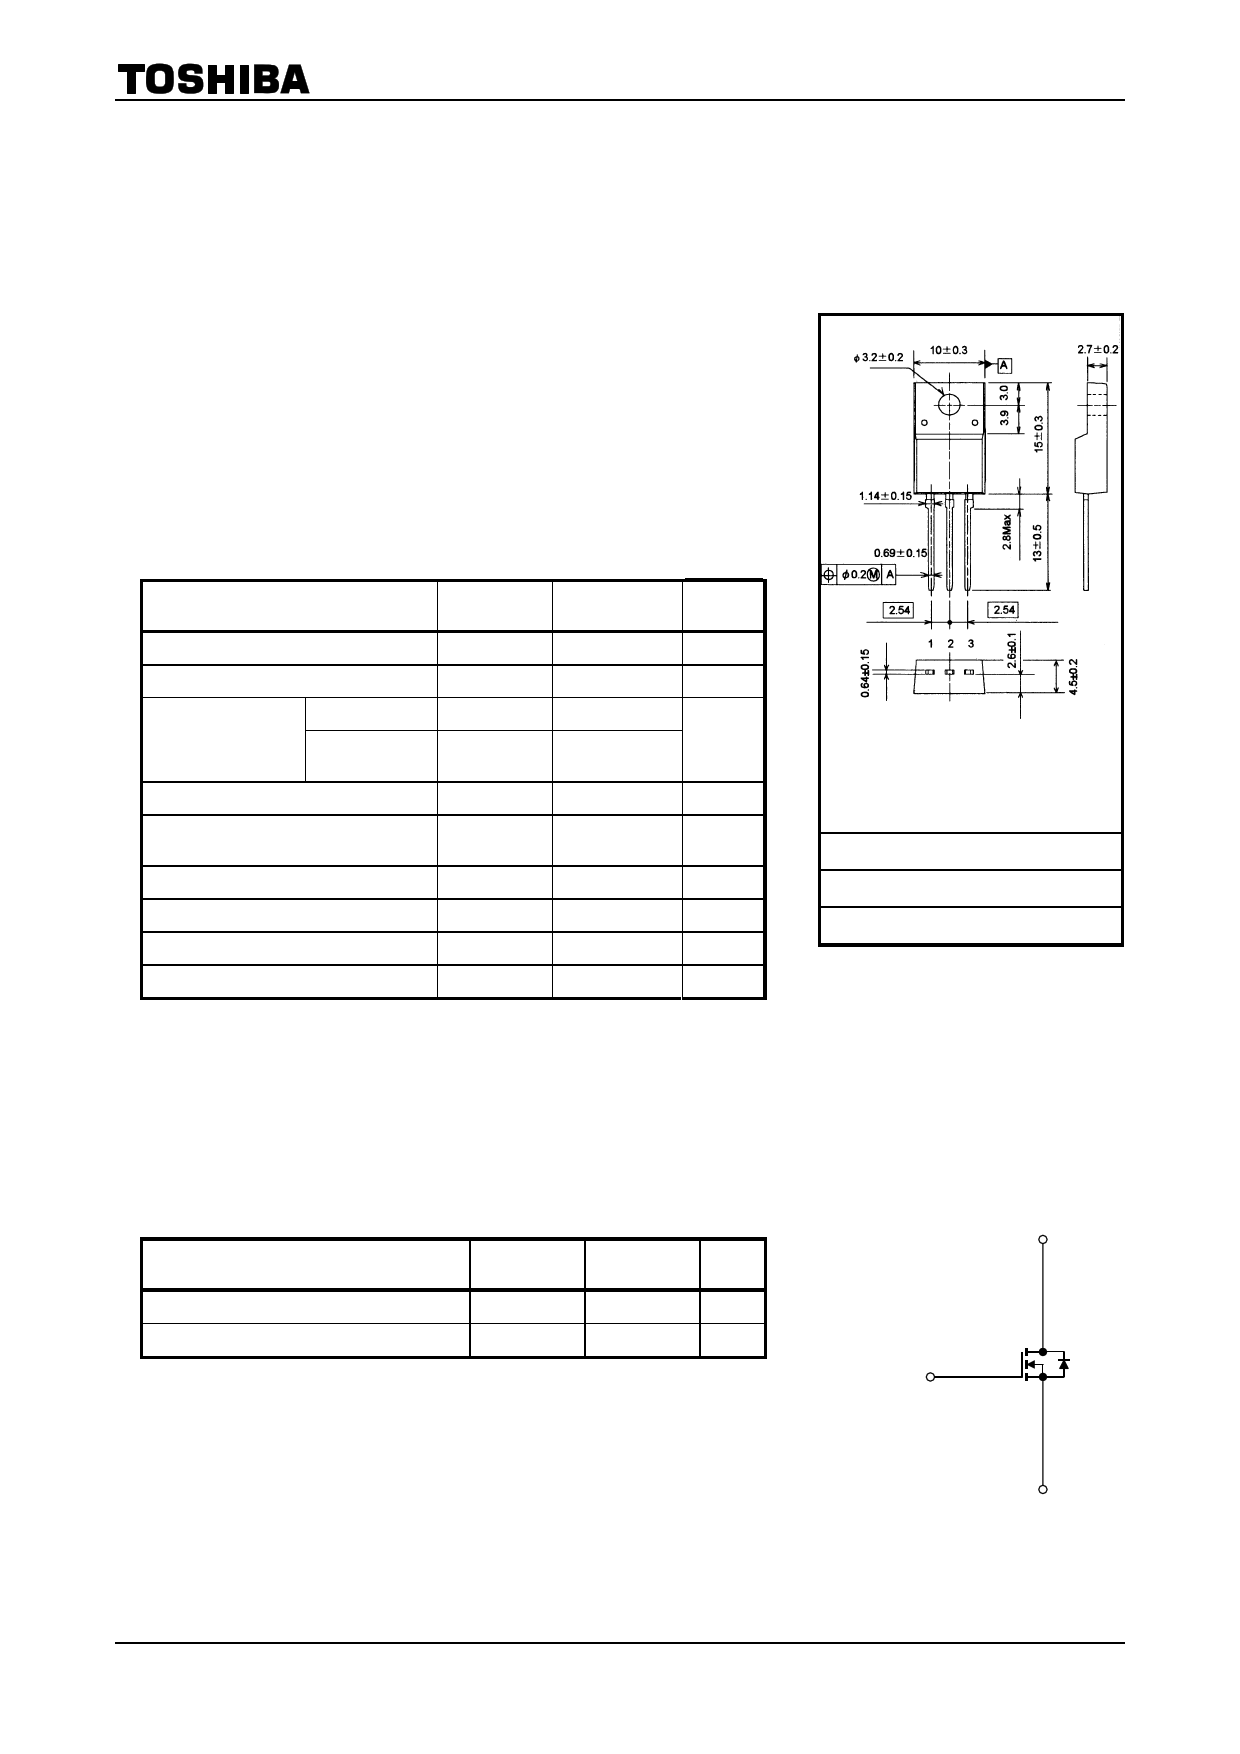 K6A60D datasheet image